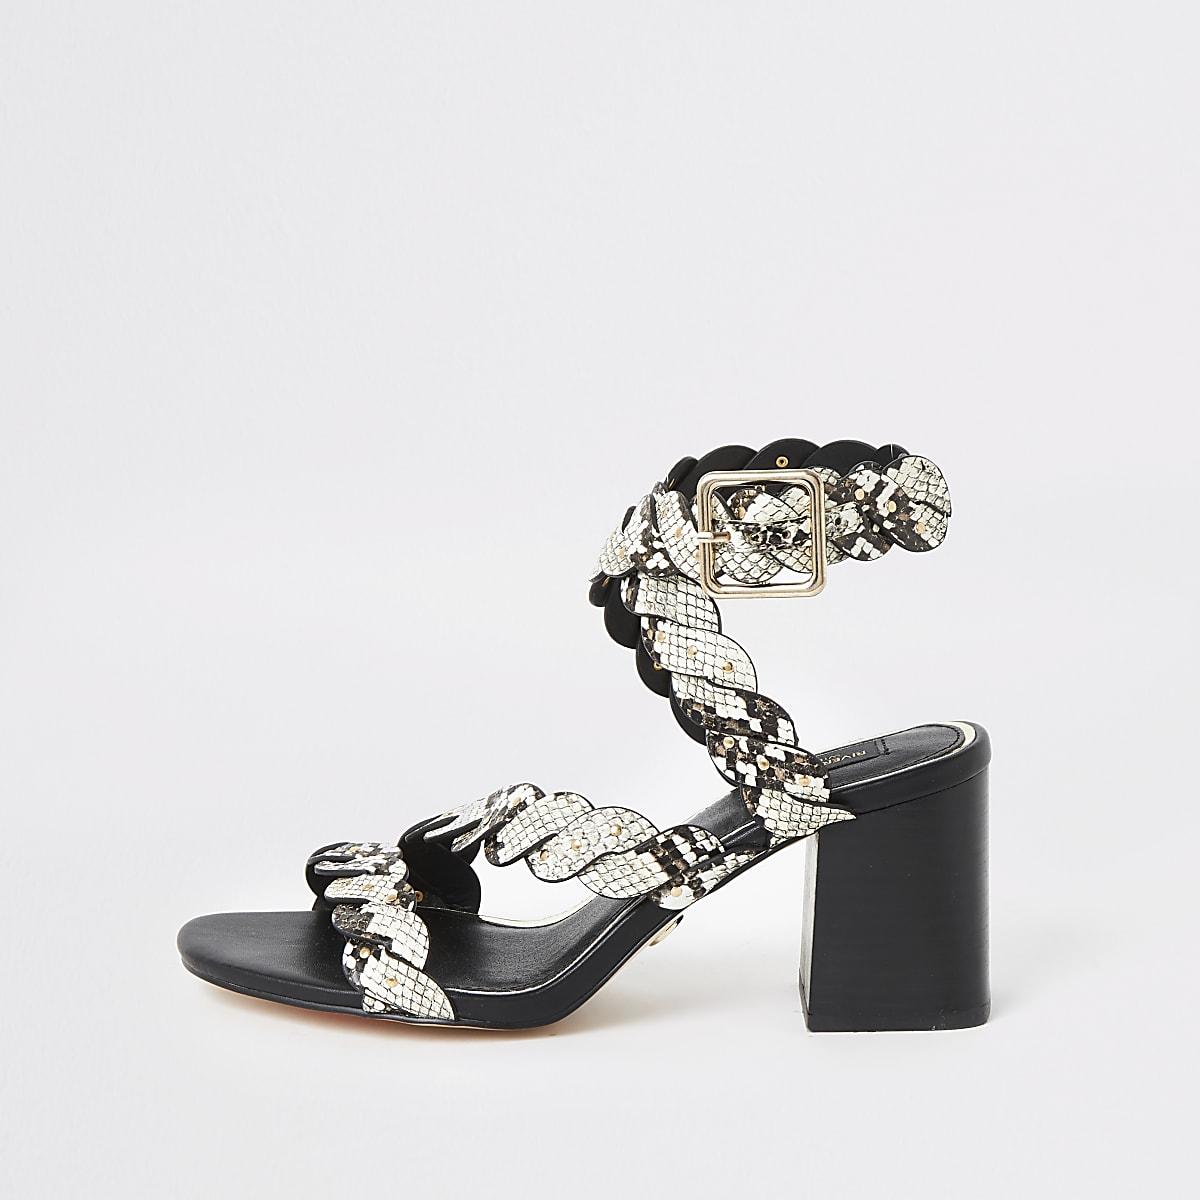 8994a4702d5 Grey snake studded wide fit block heel sandal - Sandals - Shoes   Boots -  women